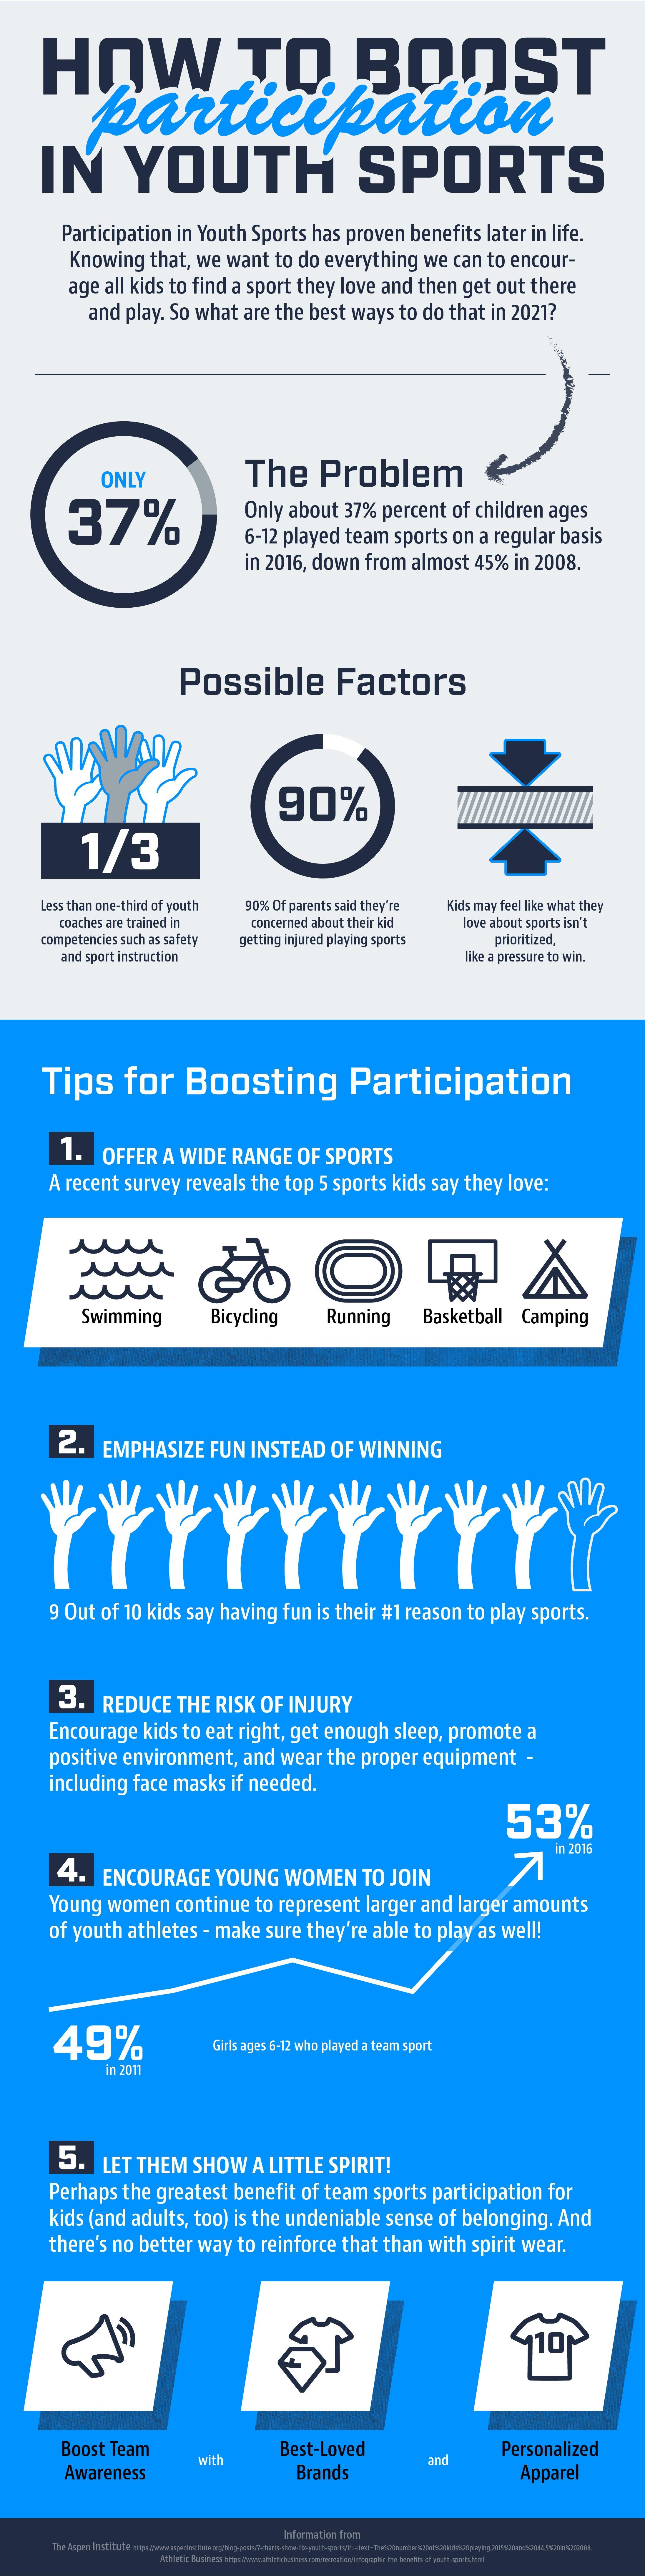 01-22-2021-Infographic-BoostingParticipationInYouthSports